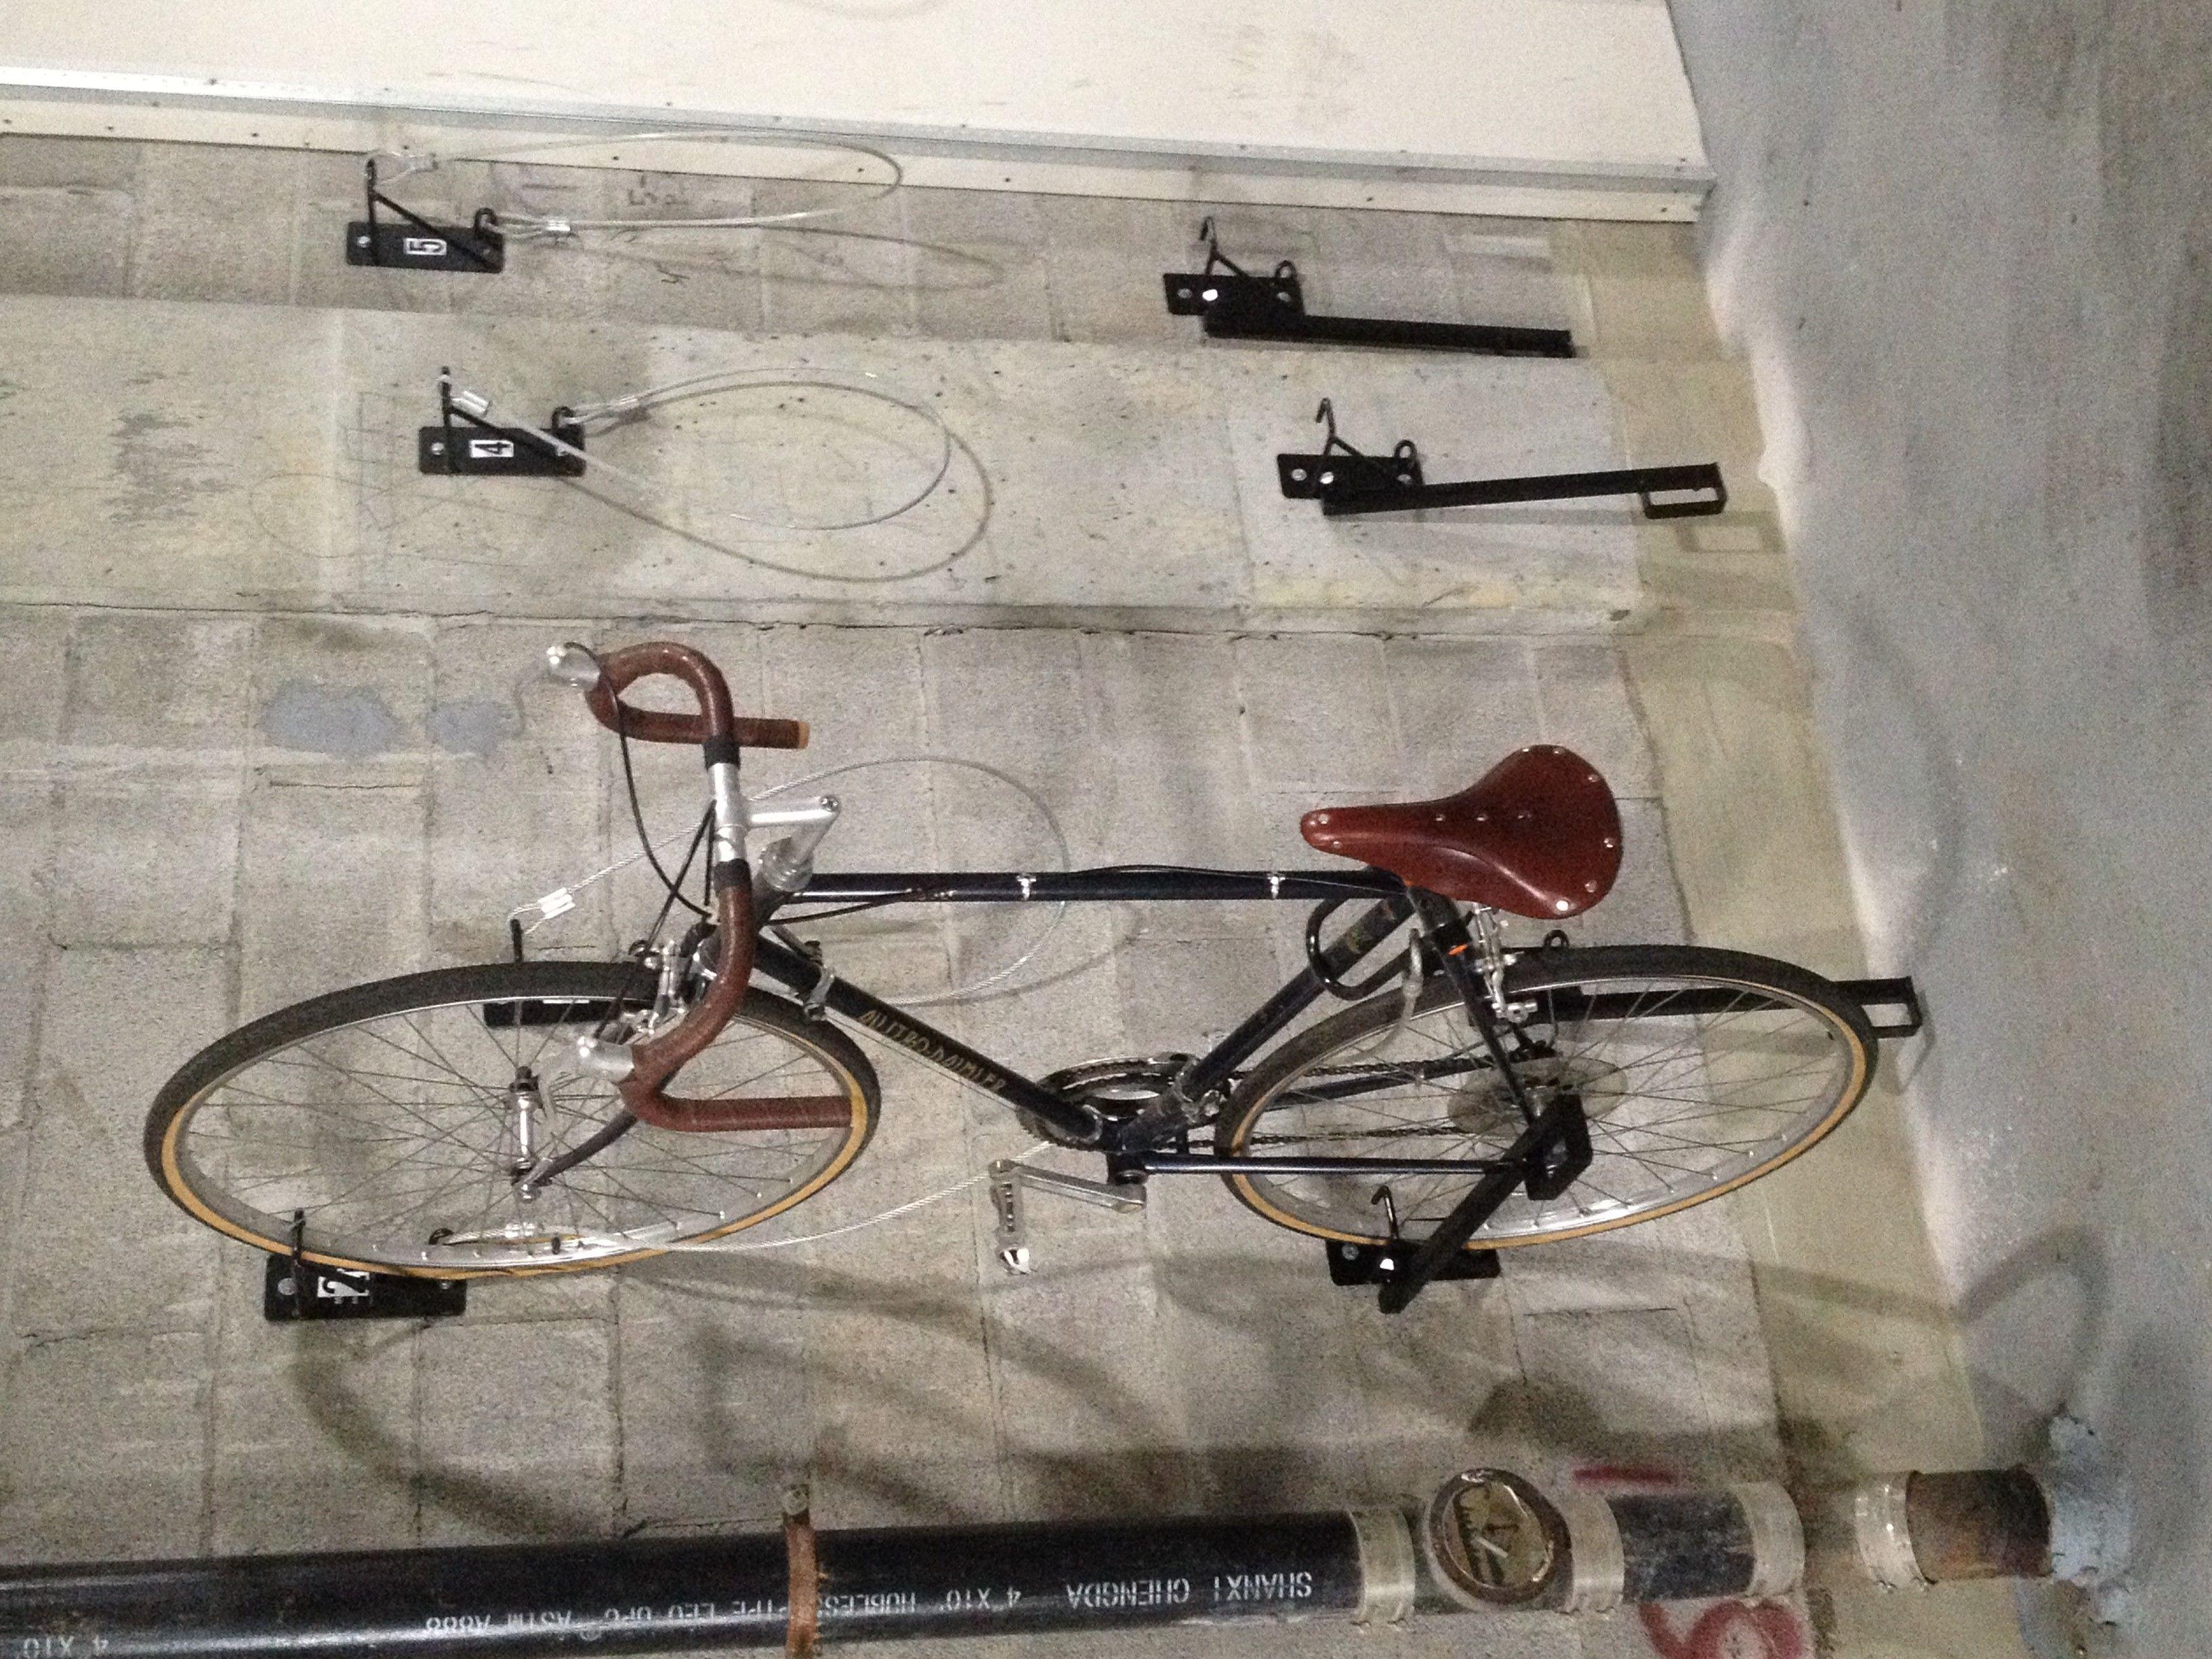 Wall Mount Bike Brackets Anti Theft Chicago All Welded Bike